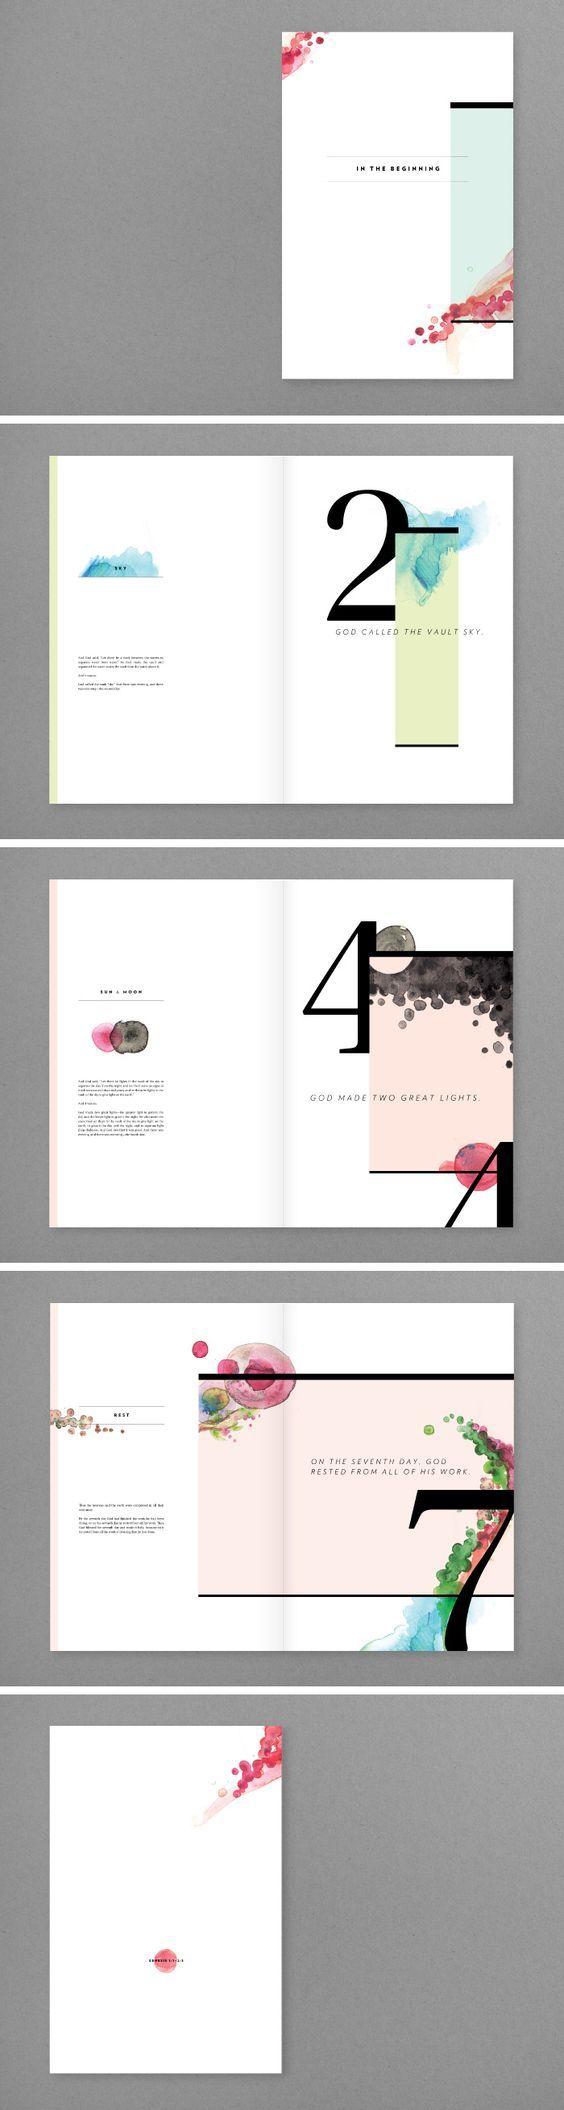 Beautiful minimal editorial design